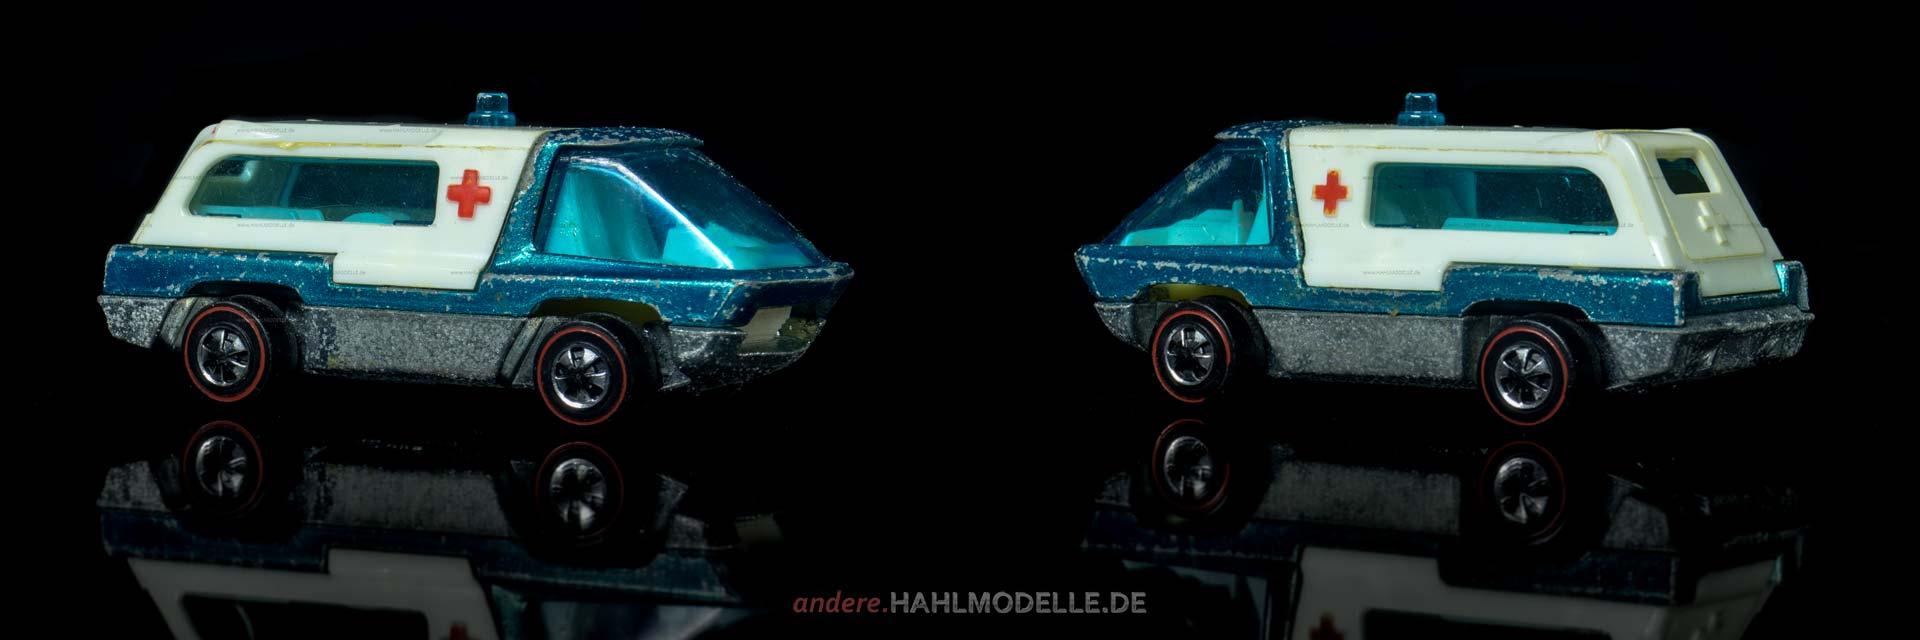 """Ambulance"" | Krankenwagen | Mattel Inc. Hong Kong | Hot Wheels | The Heavyweights | 1:64 | www.andere.hahlmodelle.de"